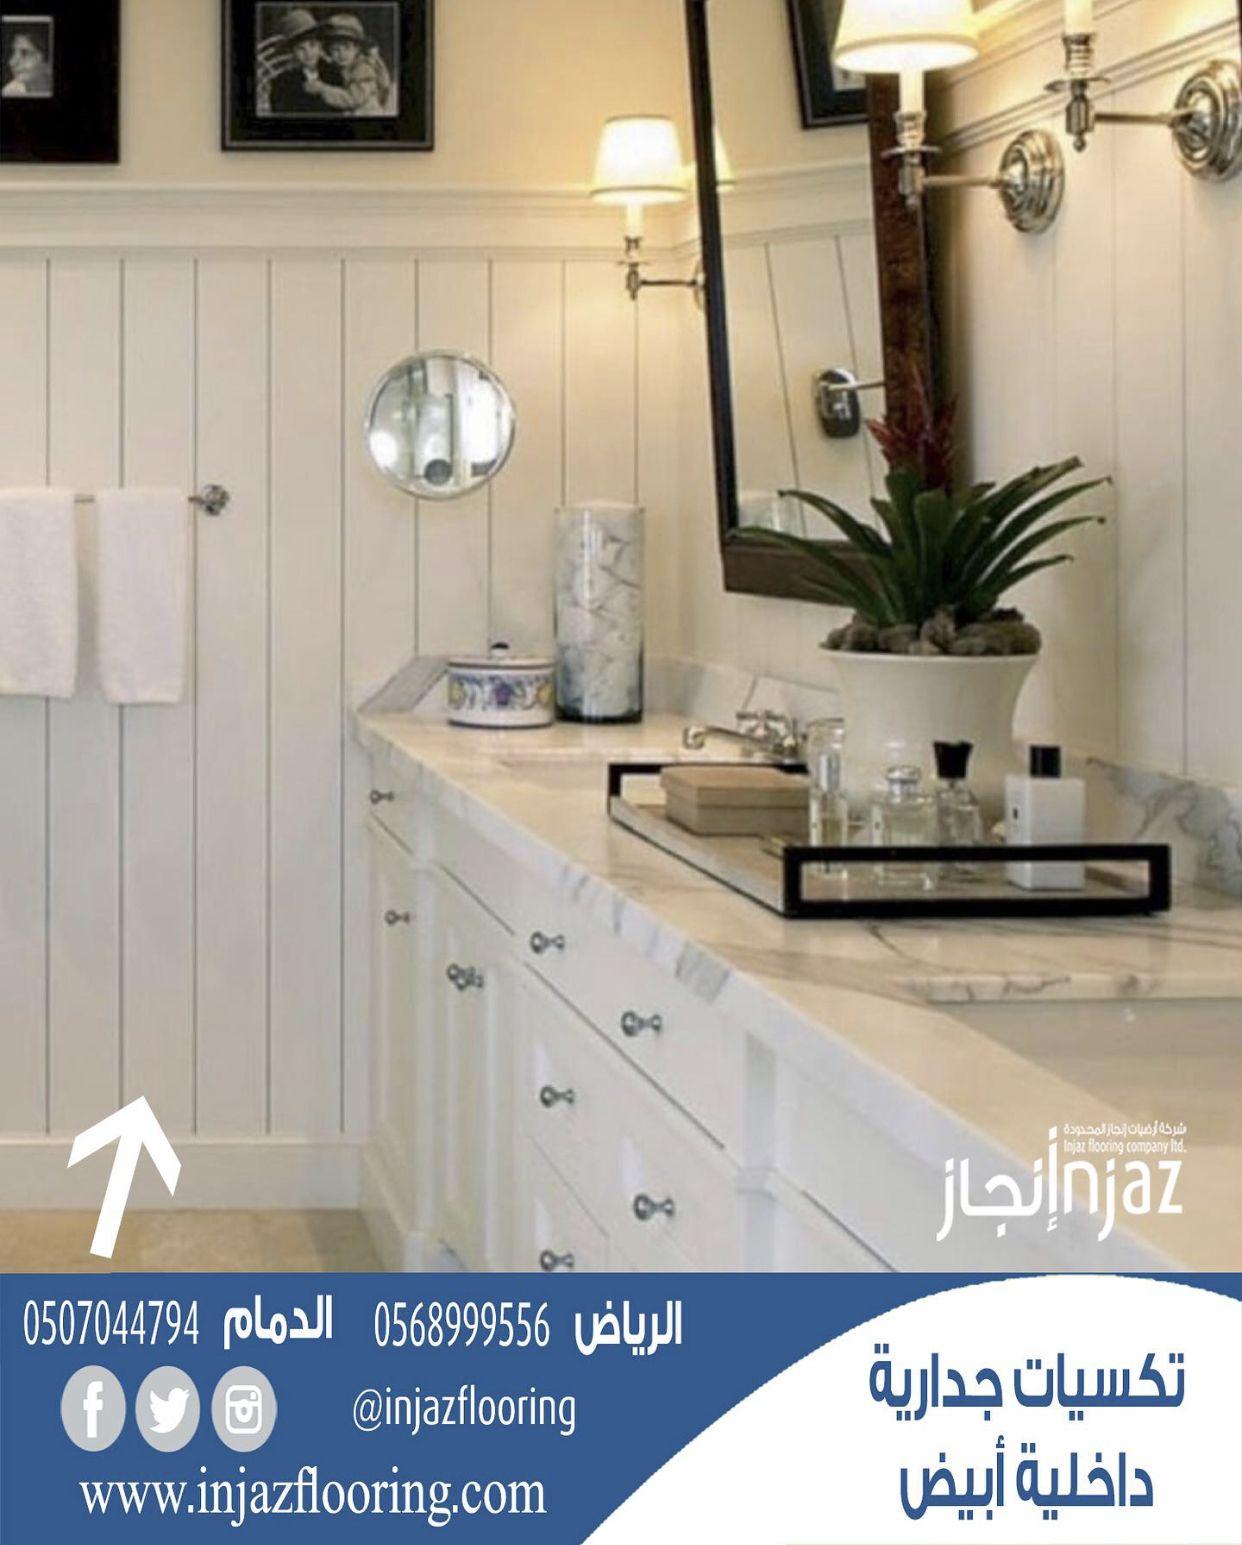 باوكيه صيني سماكة 8 ملم Wood Laminate Flooring Wood Laminate Kitchen Cabinets